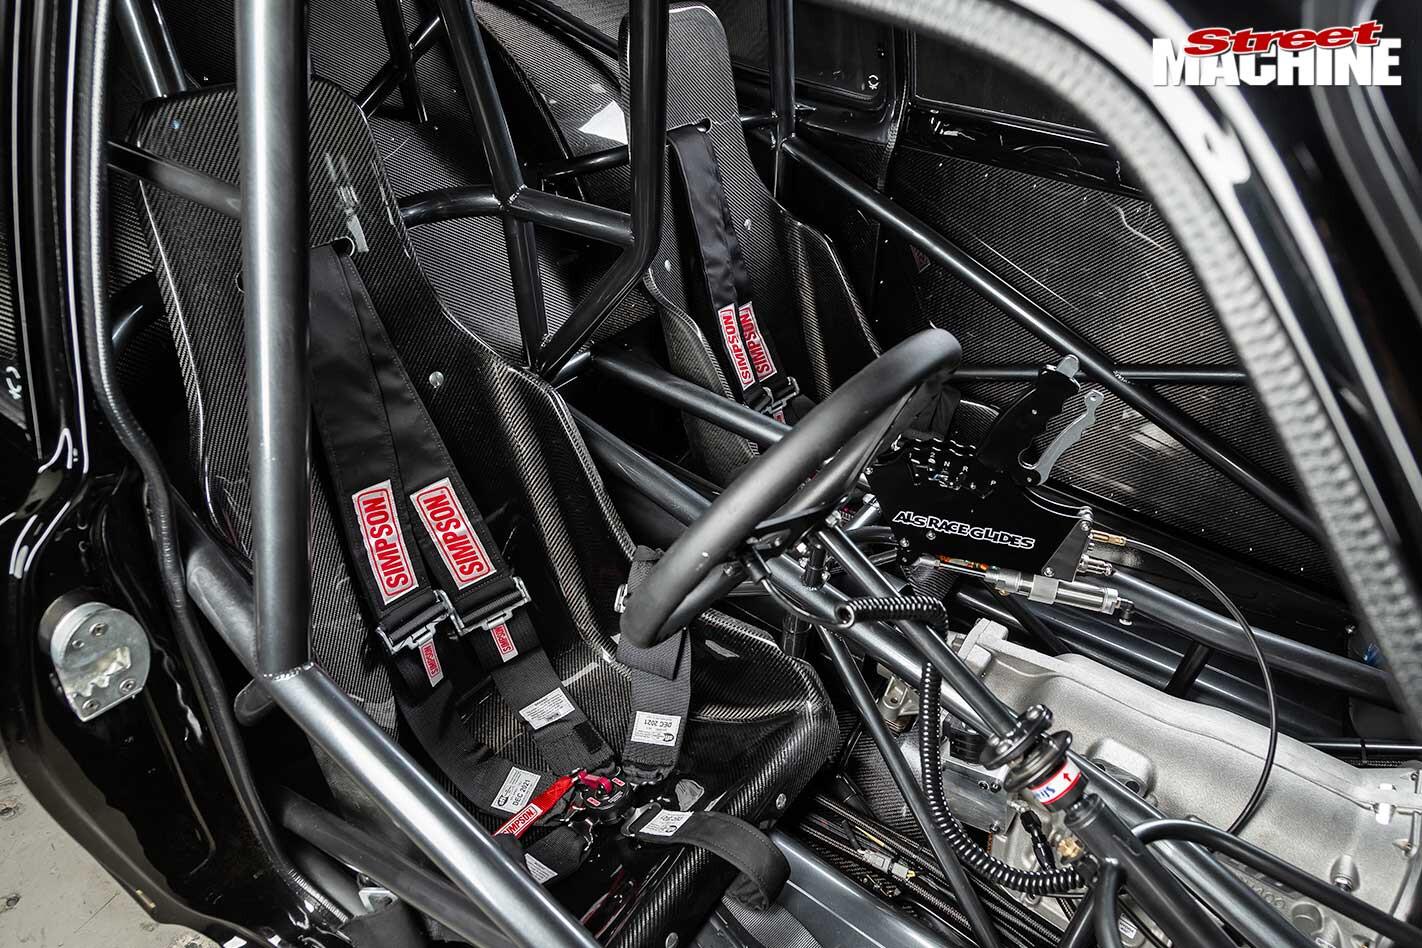 Holden LJ Torana seats